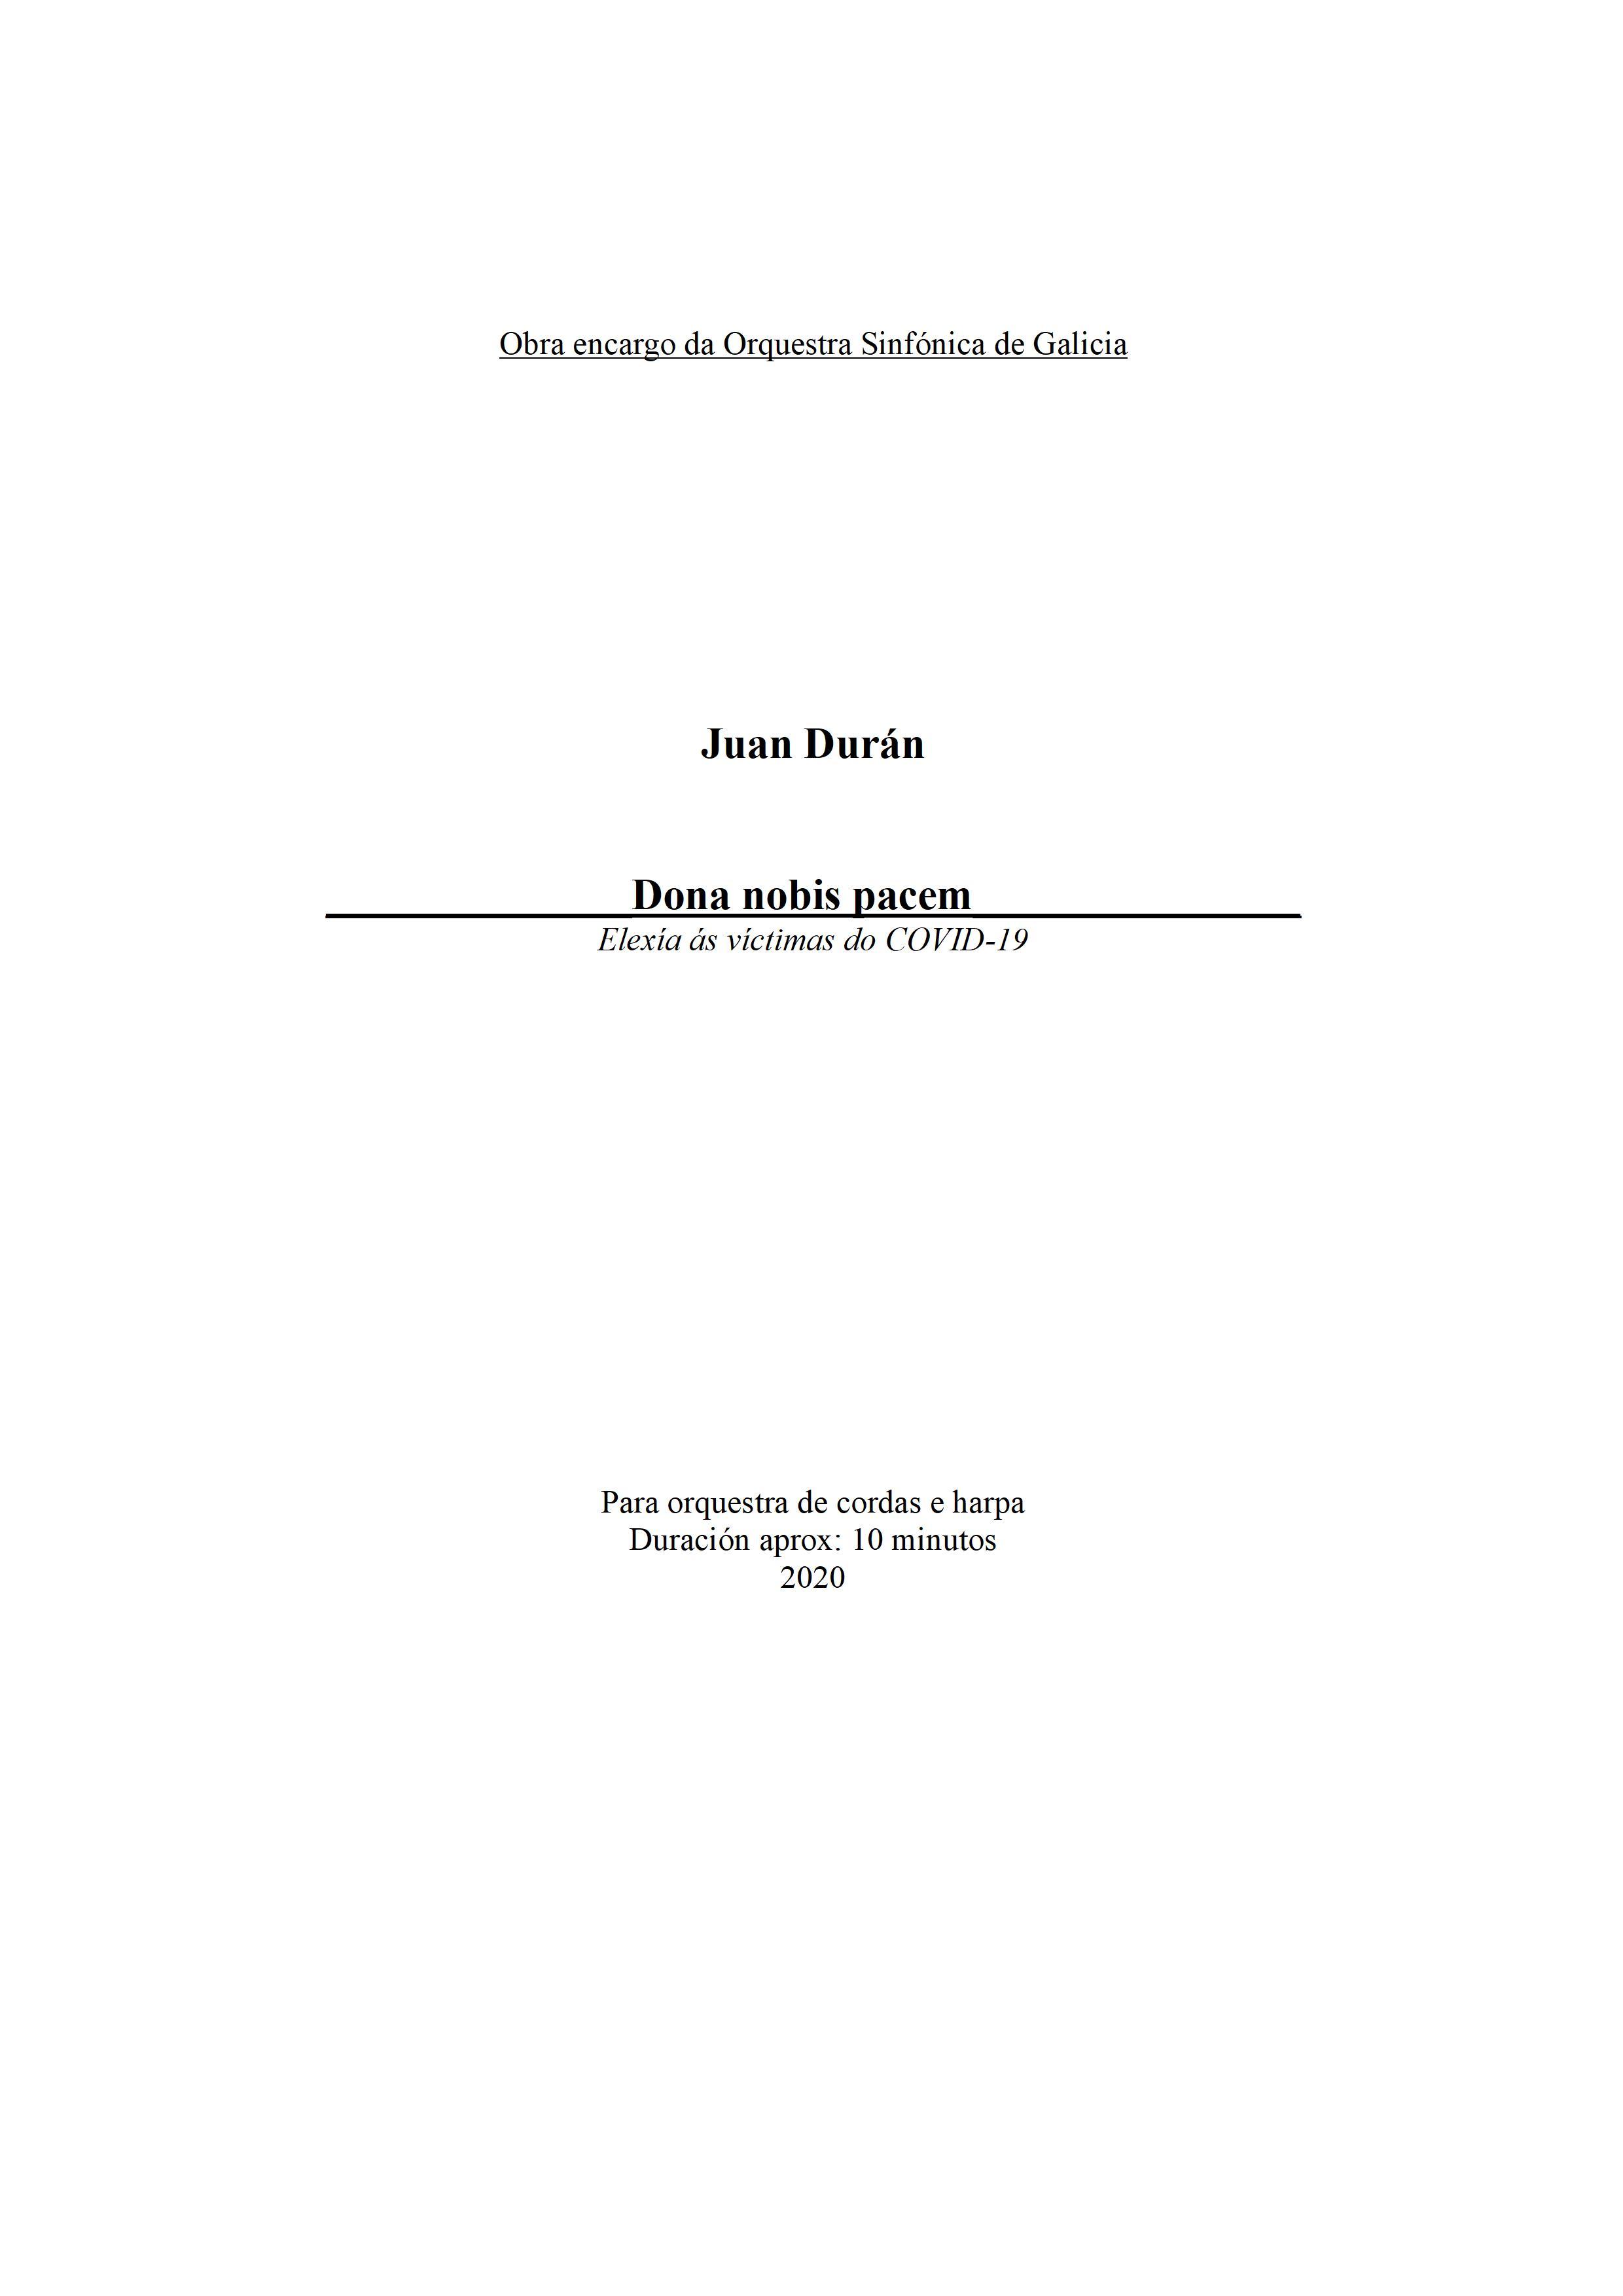 Estrea de Dona nobis pacem de J. Durán